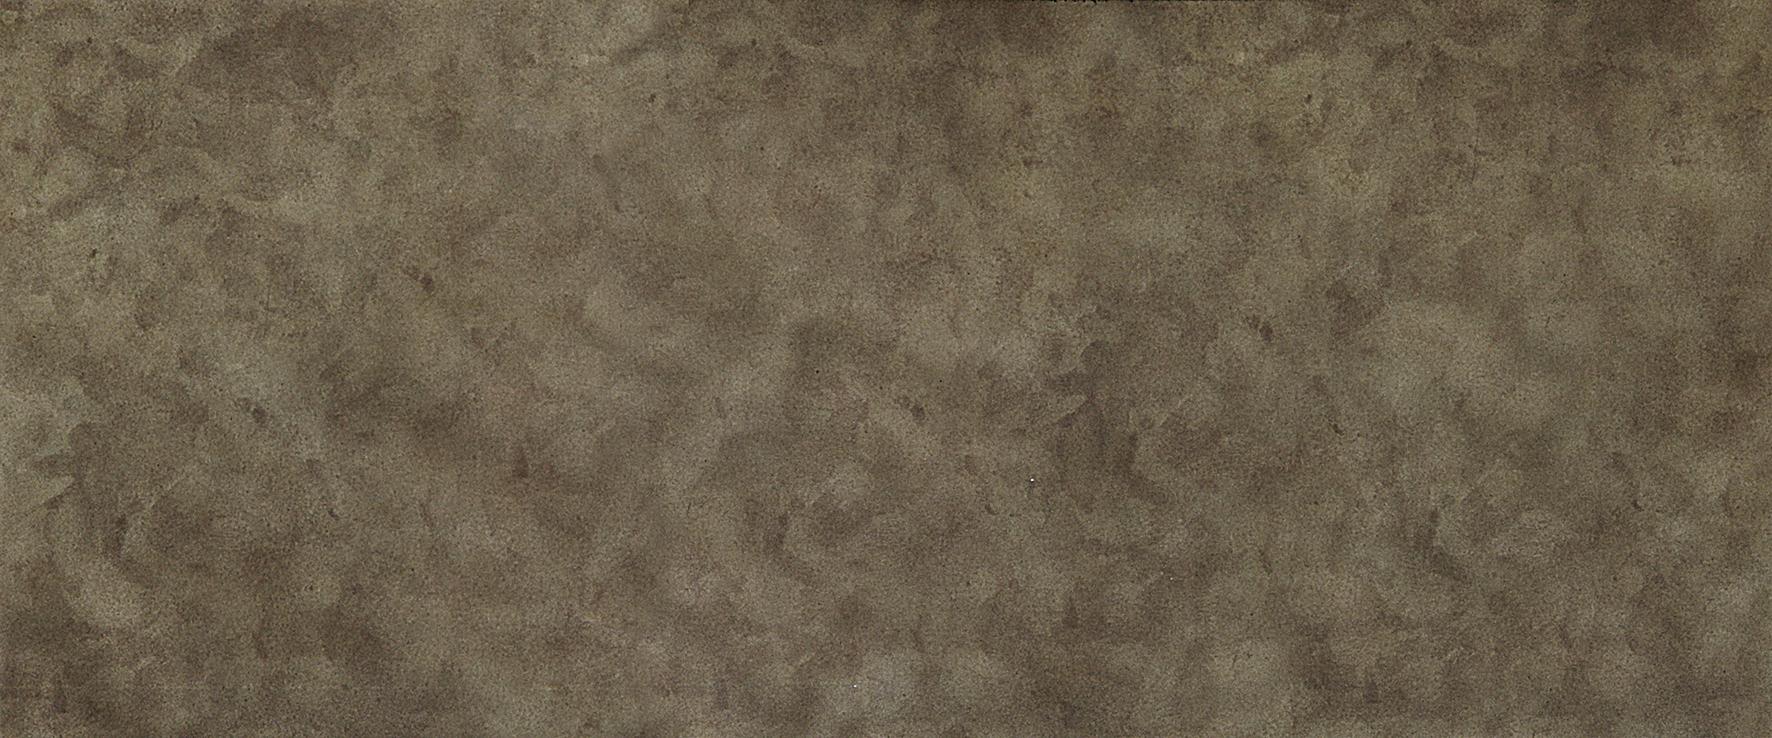 Patchwork brown Плитка настенная 02 25х60 настенная плитка gracia ceramica patchwork beige wall 01 25x60